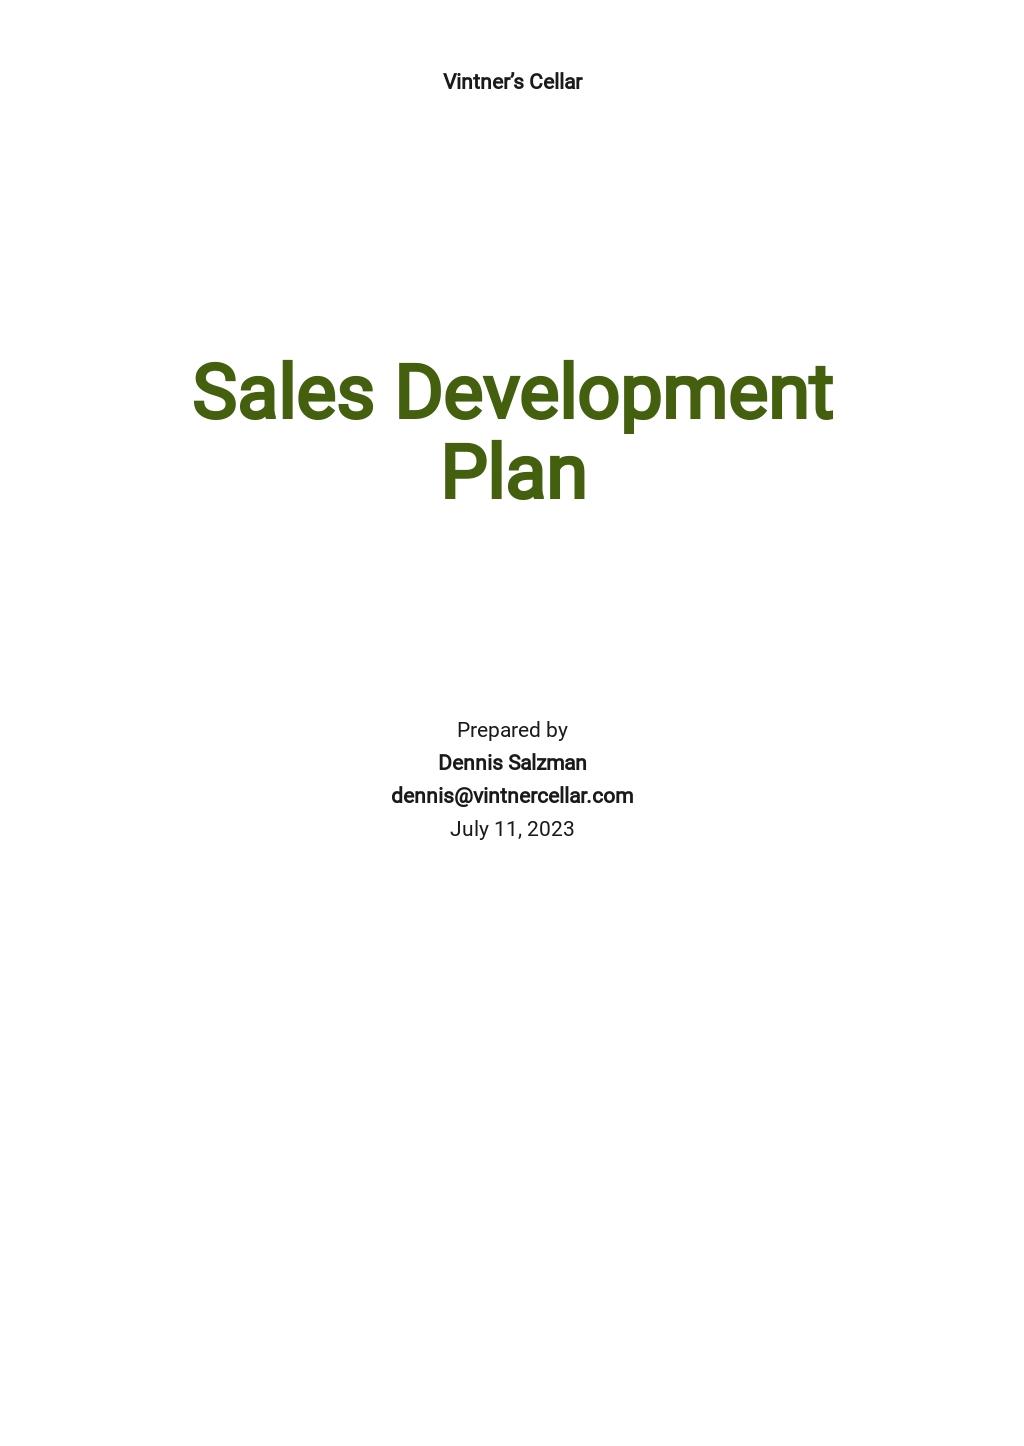 Sales Development Plan Template